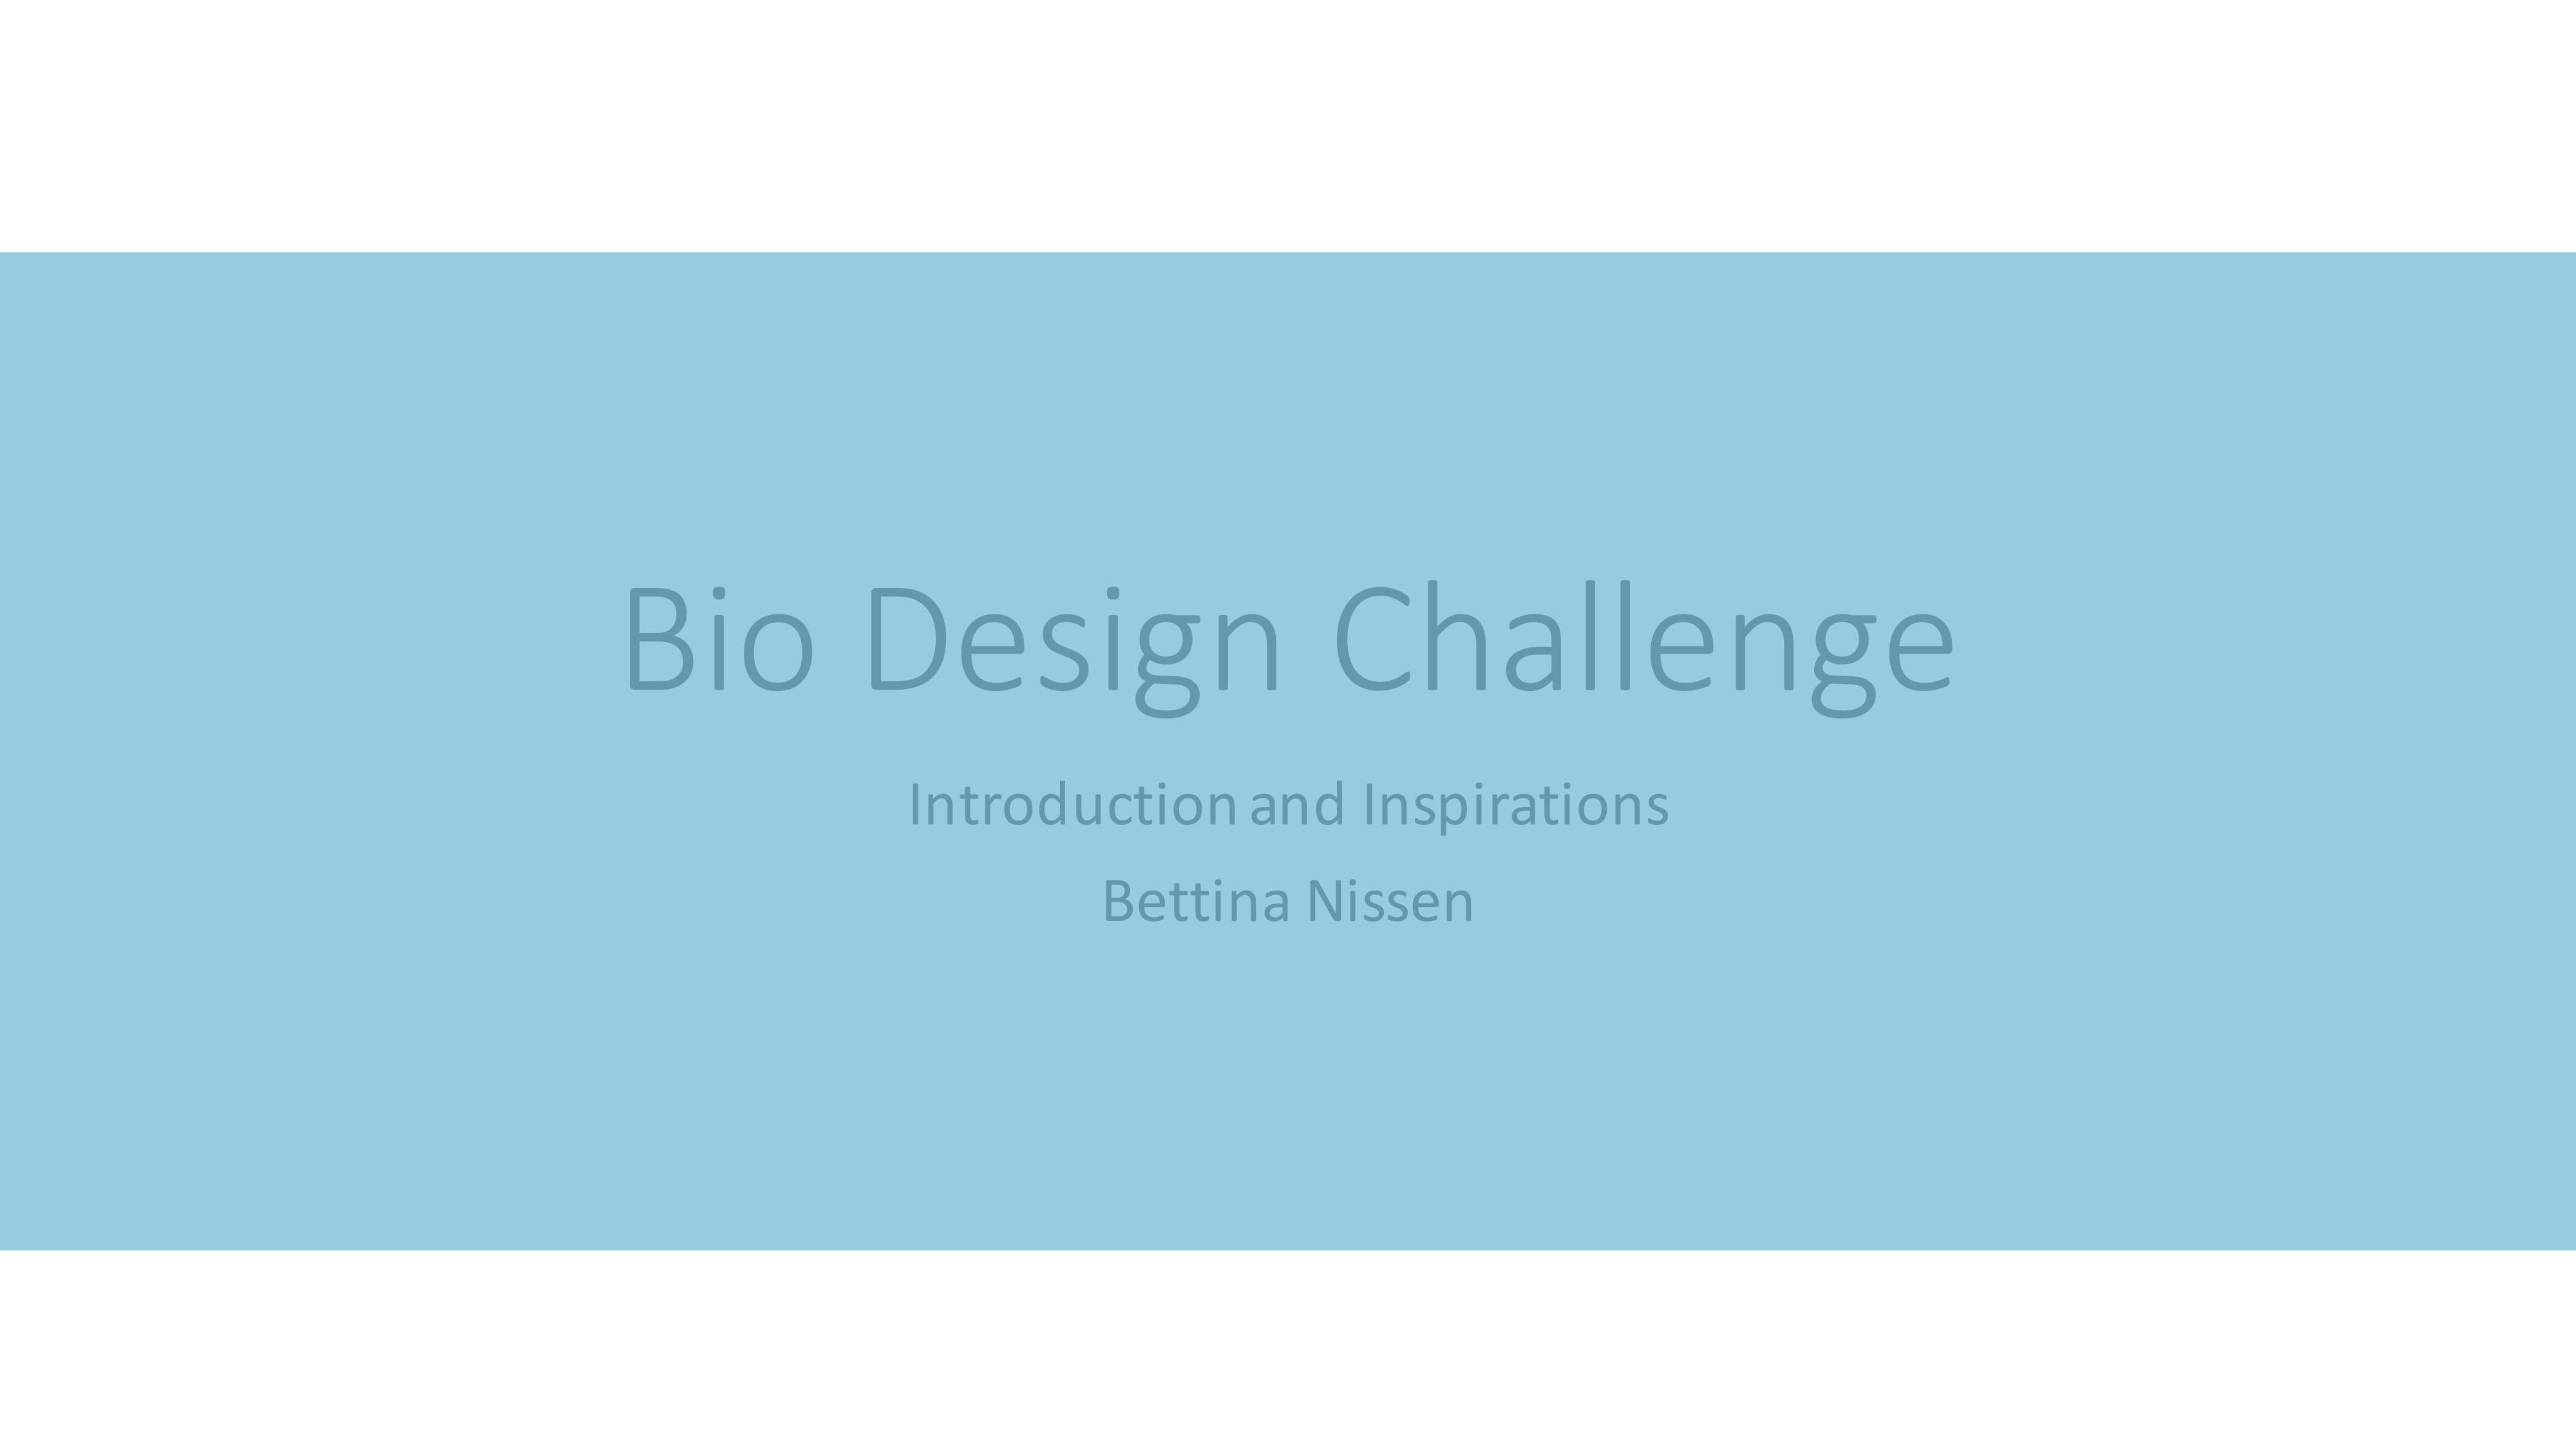 Bettina's presentation